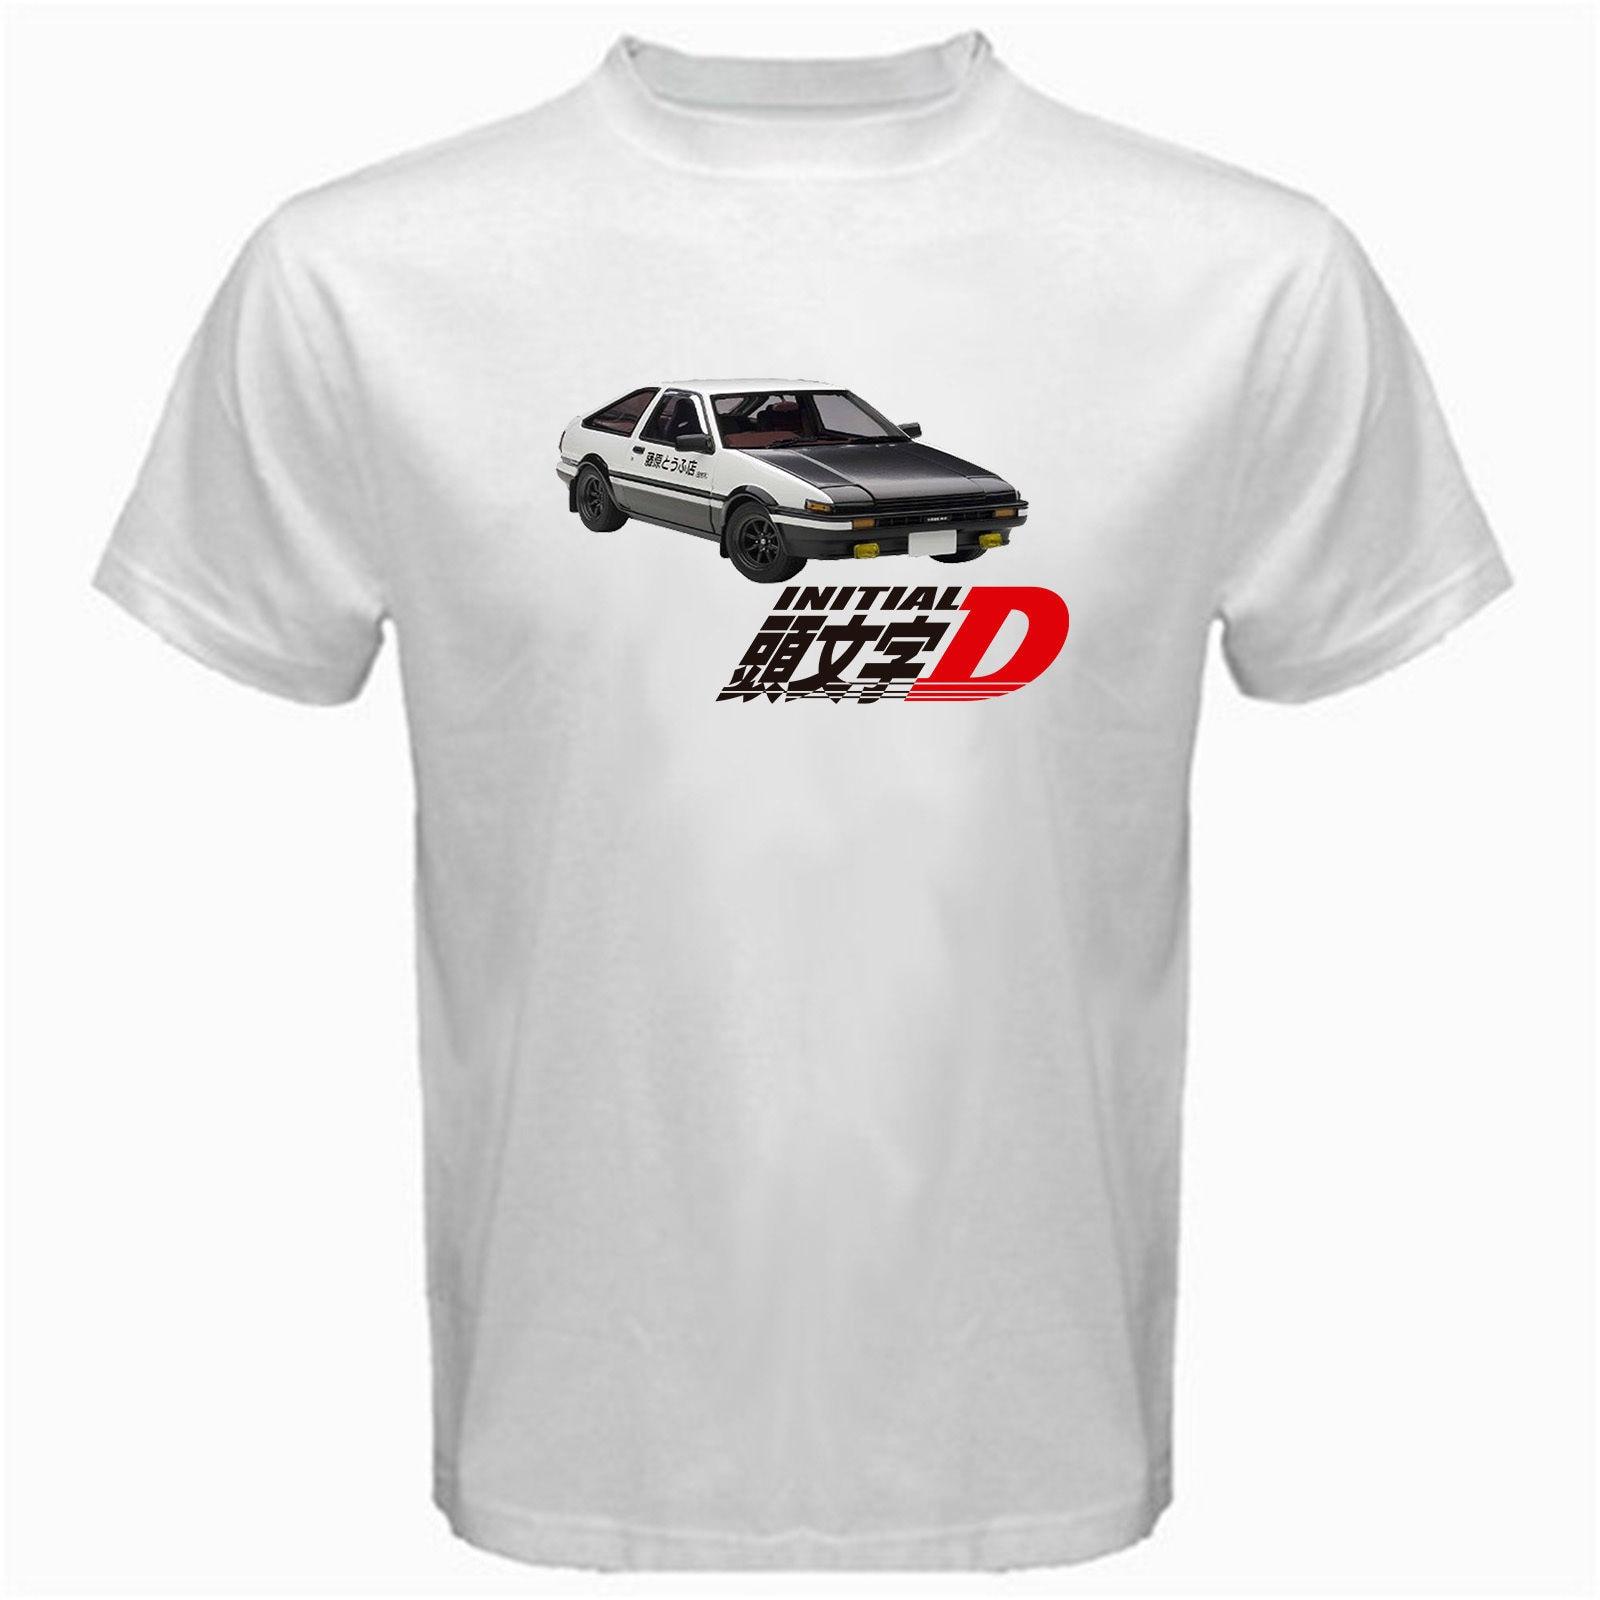 Desain t shirt racing - Awal D Ae86 Trueno Takumi Anime Jepang Drift Racinger Fujiwara Tshirt Putih China Mainland